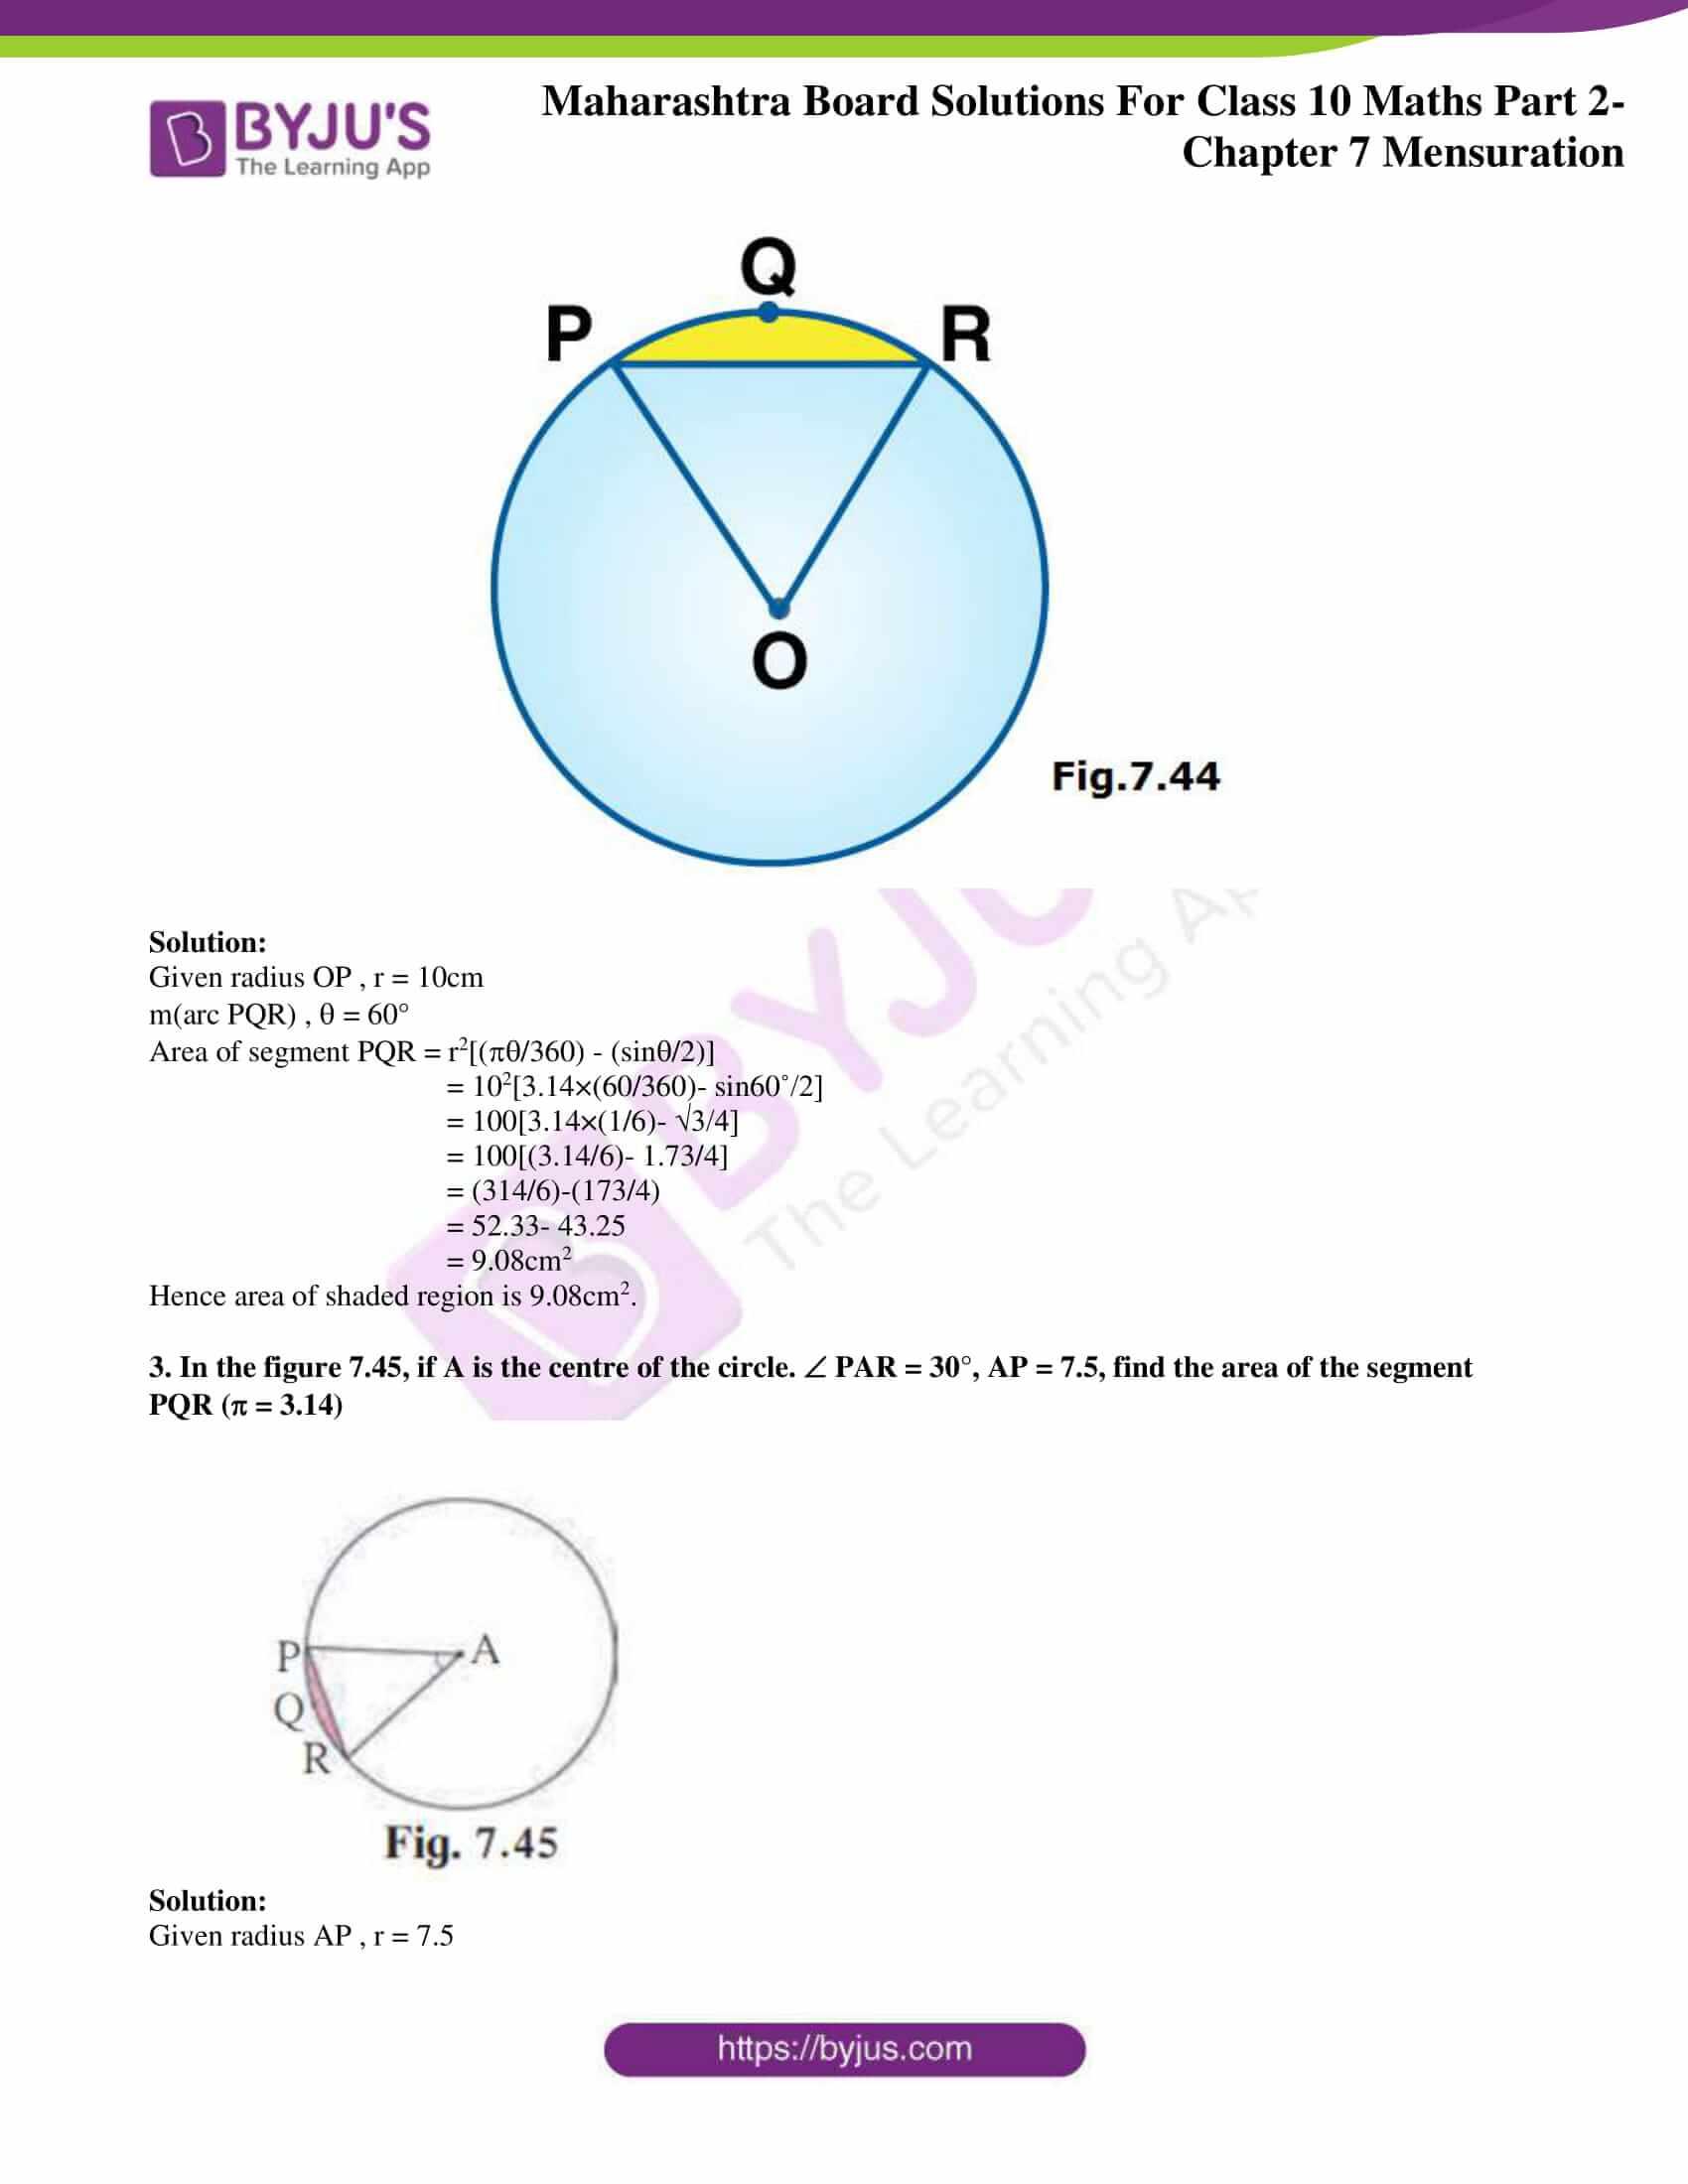 msbshse sol class 10 maths part 2 chapter 7 19